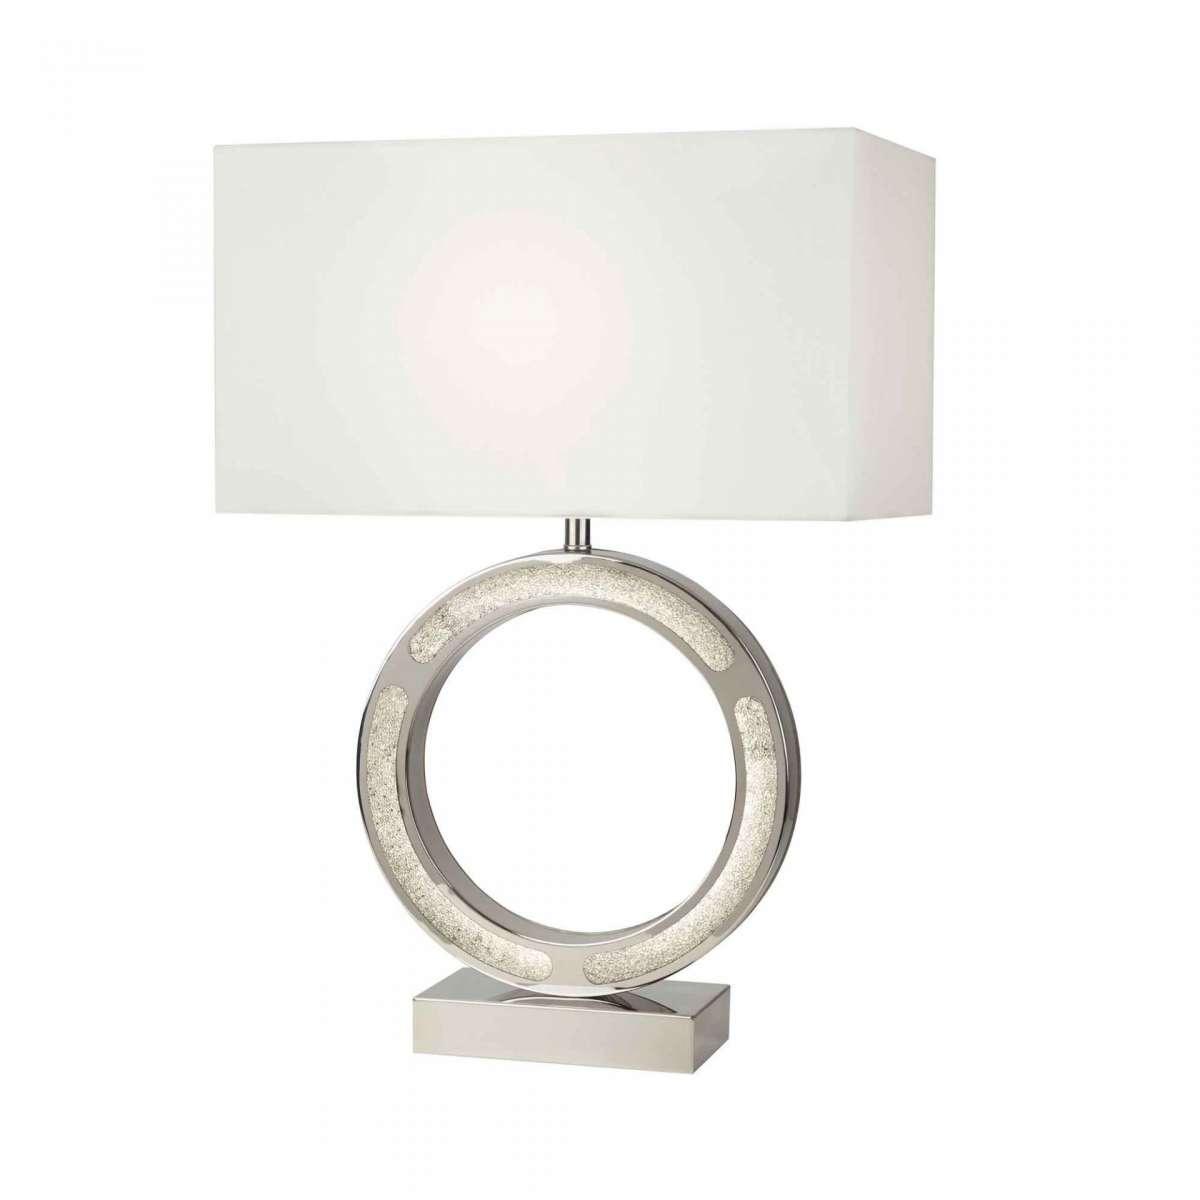 Alaska Table Lamp with 7W LED Base